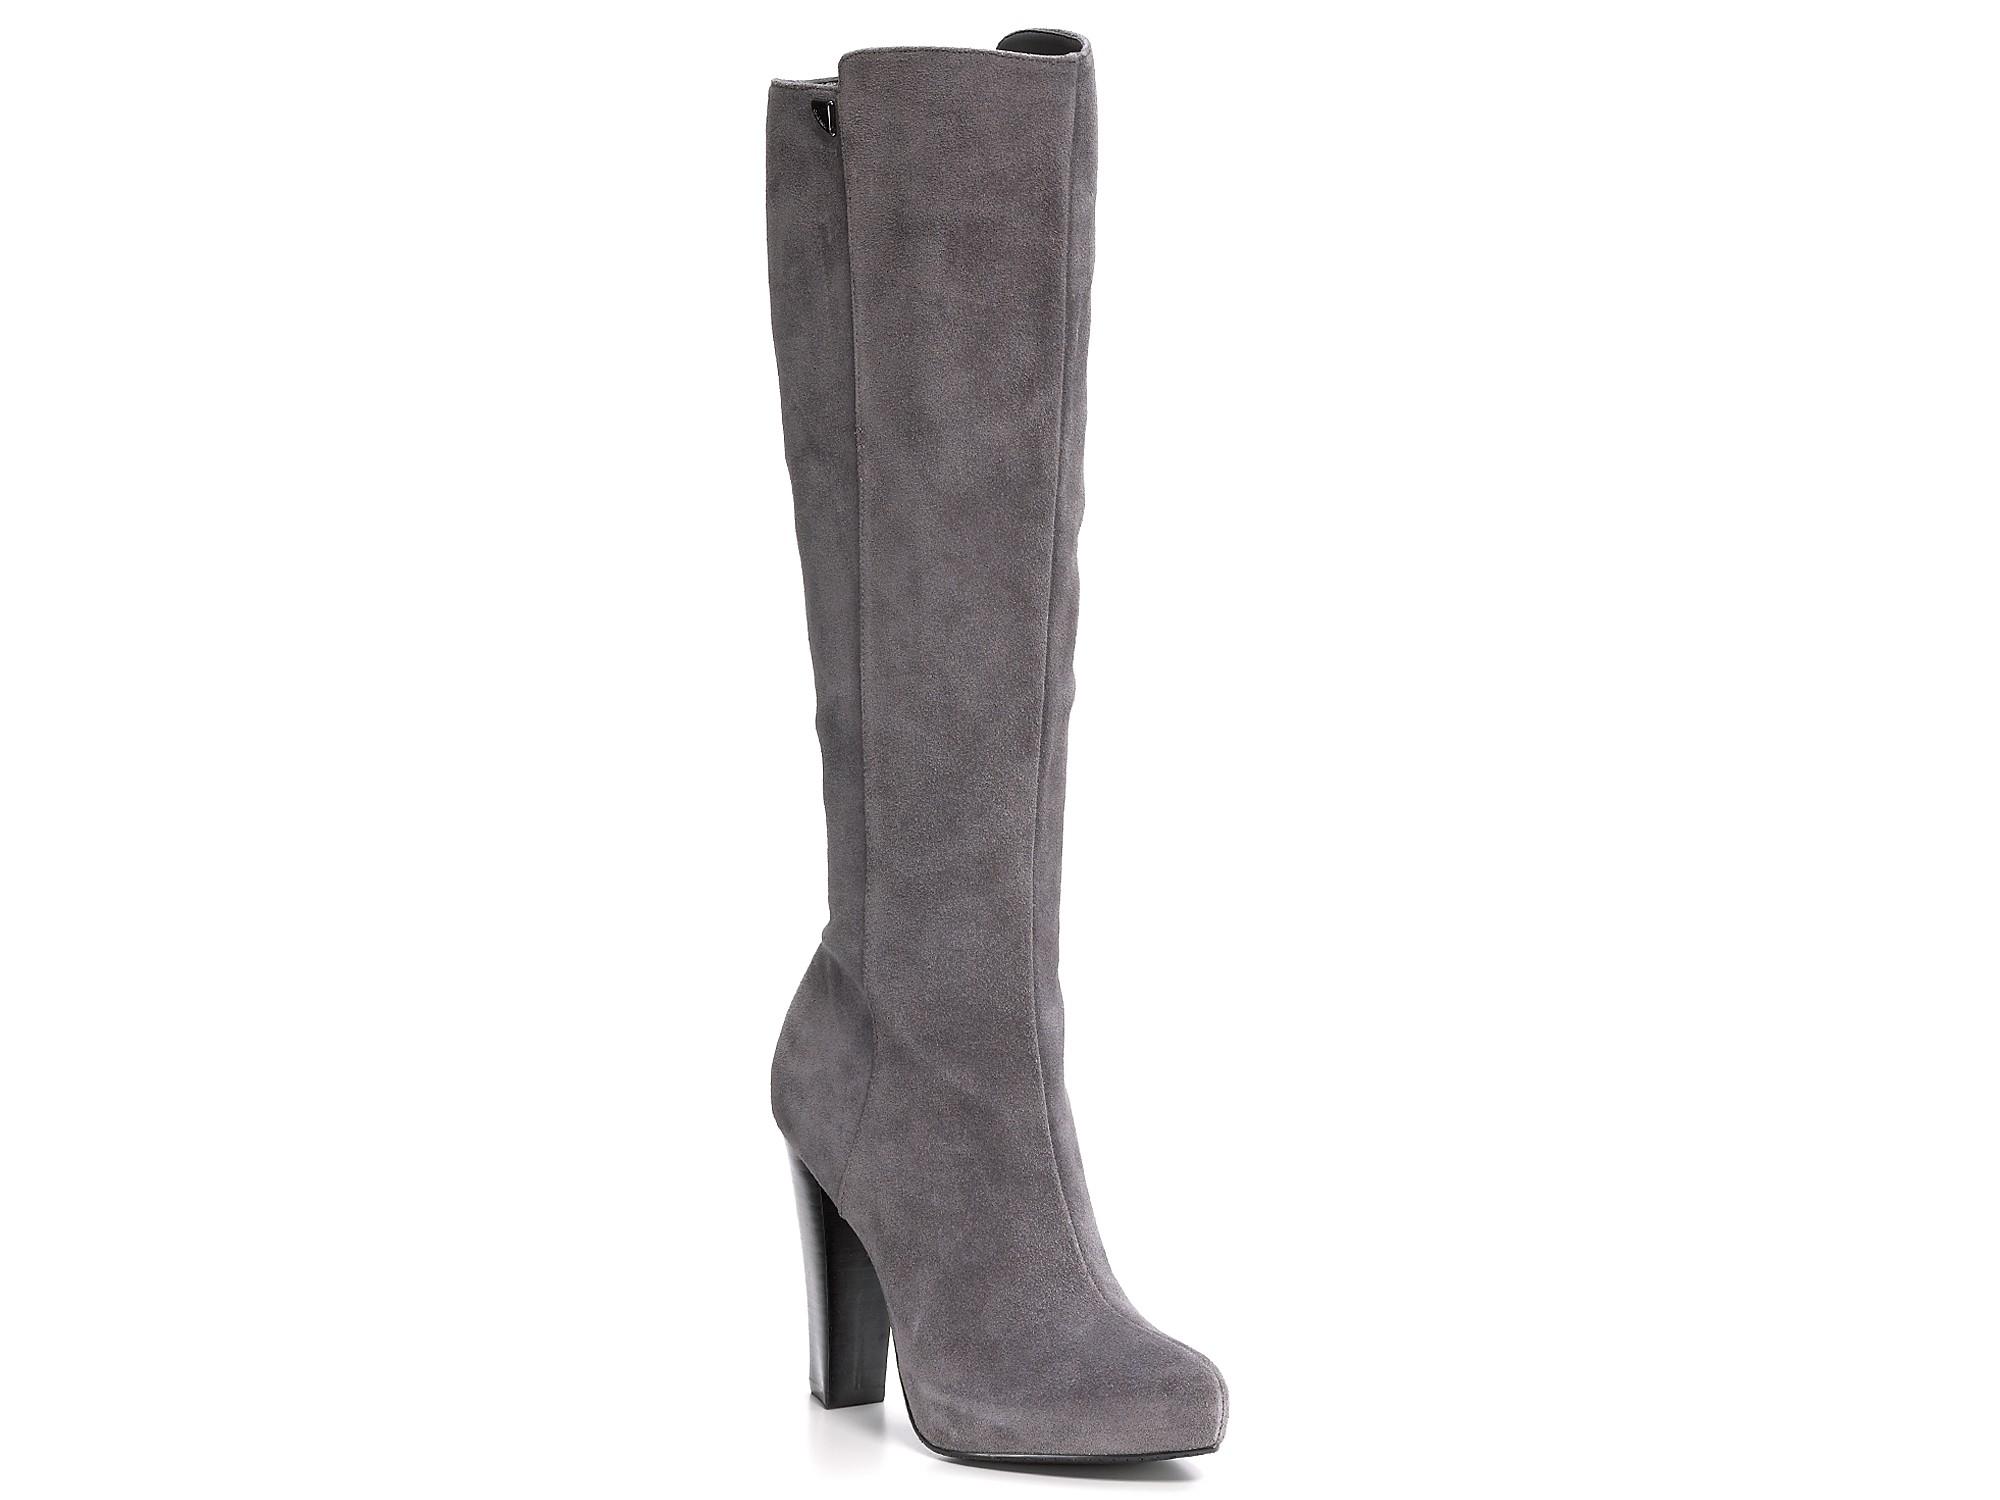 Calvin klein Eliana Tall Boots in Gray | Lyst